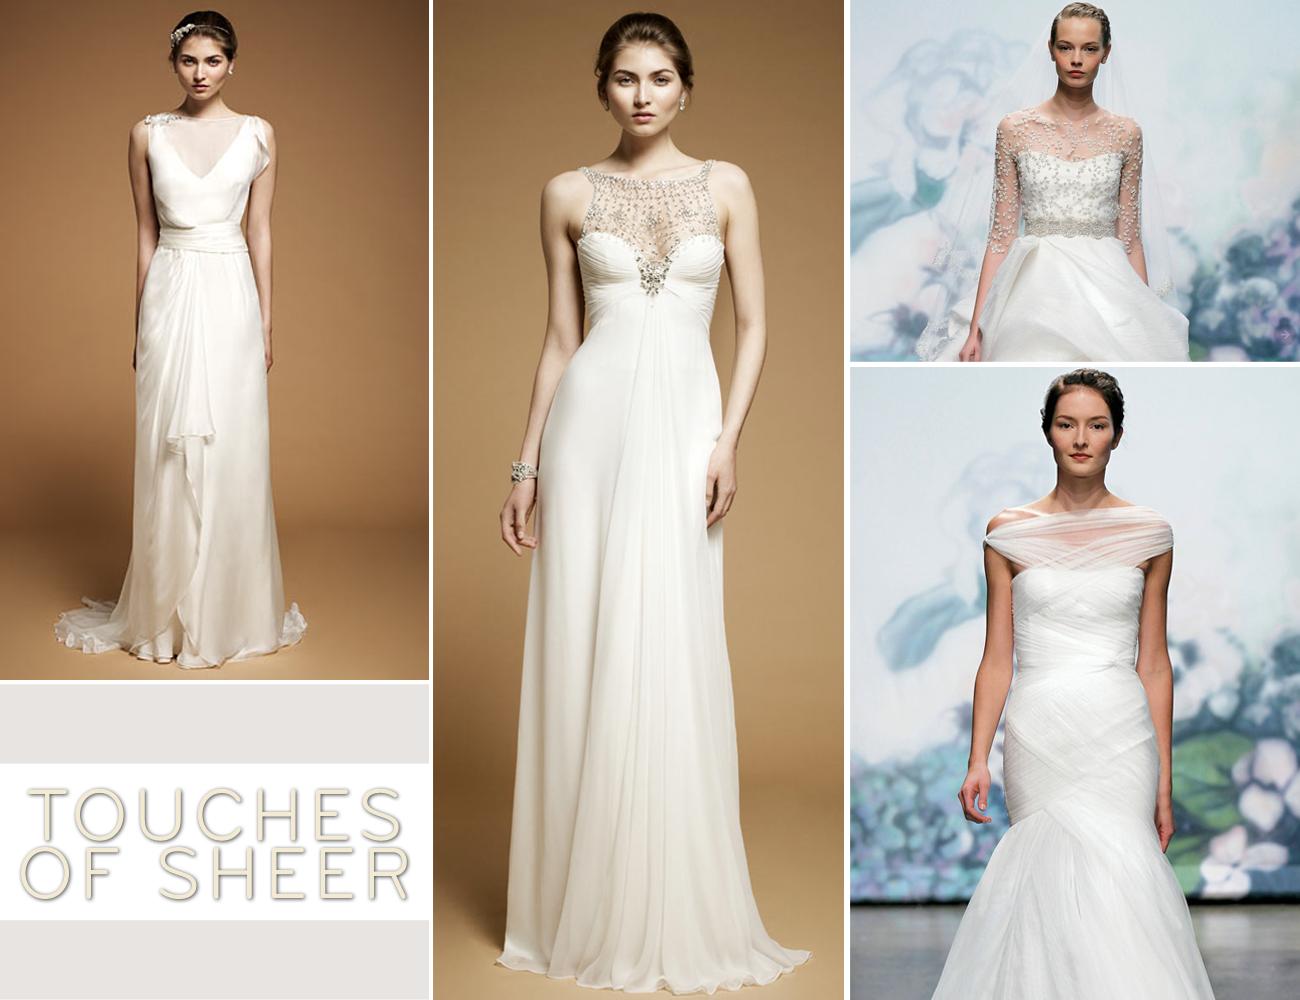 Wedding dresses for 2nd marriage  Pin by Ramona Gilia on Wedding  Pinterest  Wedding dress trends